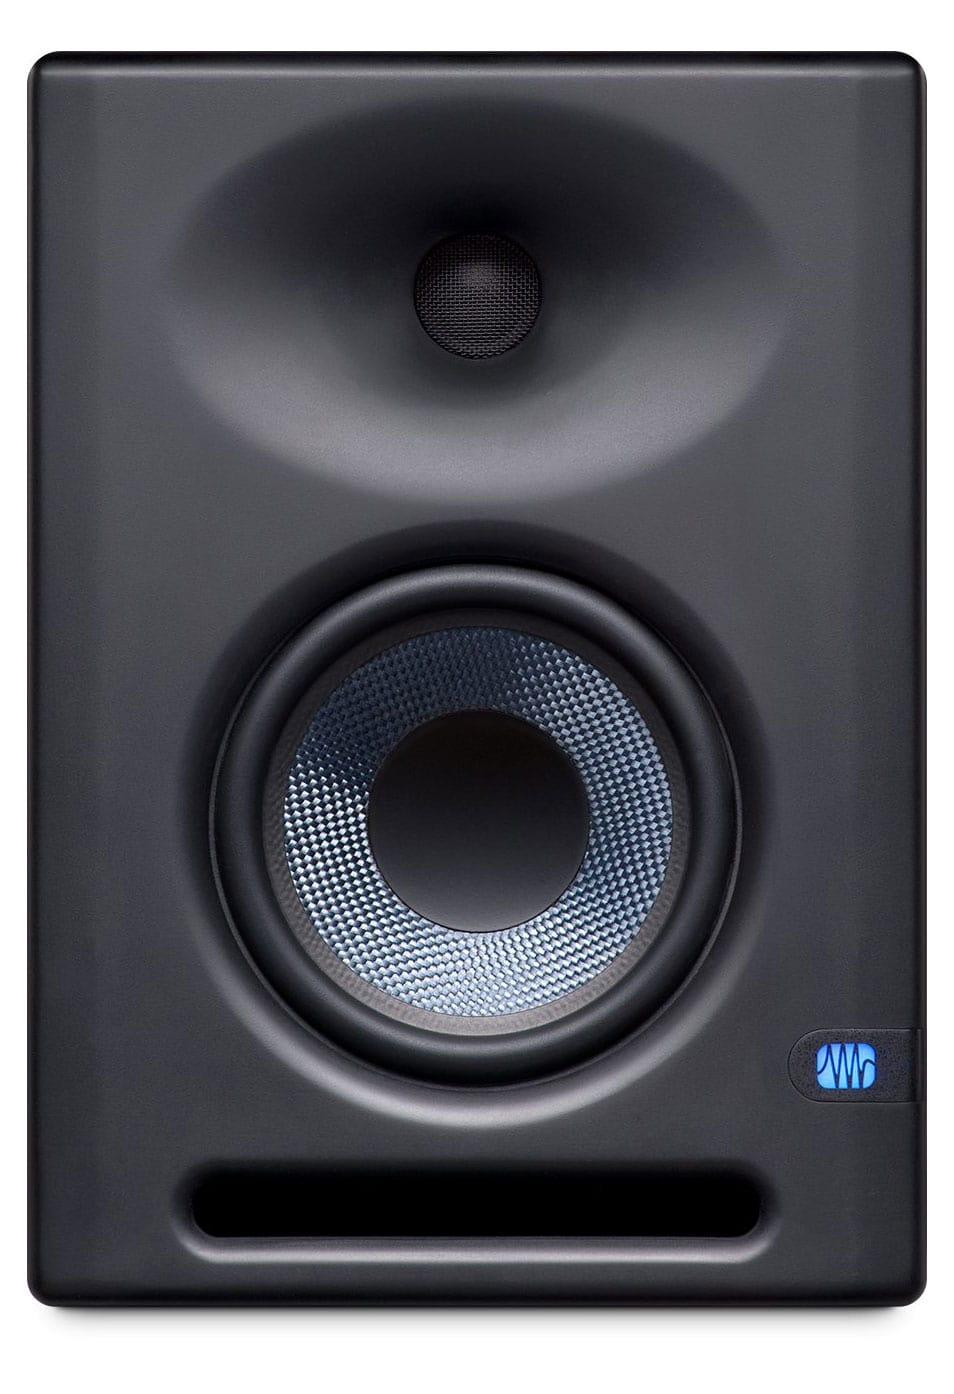 Studiomonitore - Presouns Eris E5 XT Aktiver Studiomonitor - Onlineshop Musikhaus Kirstein